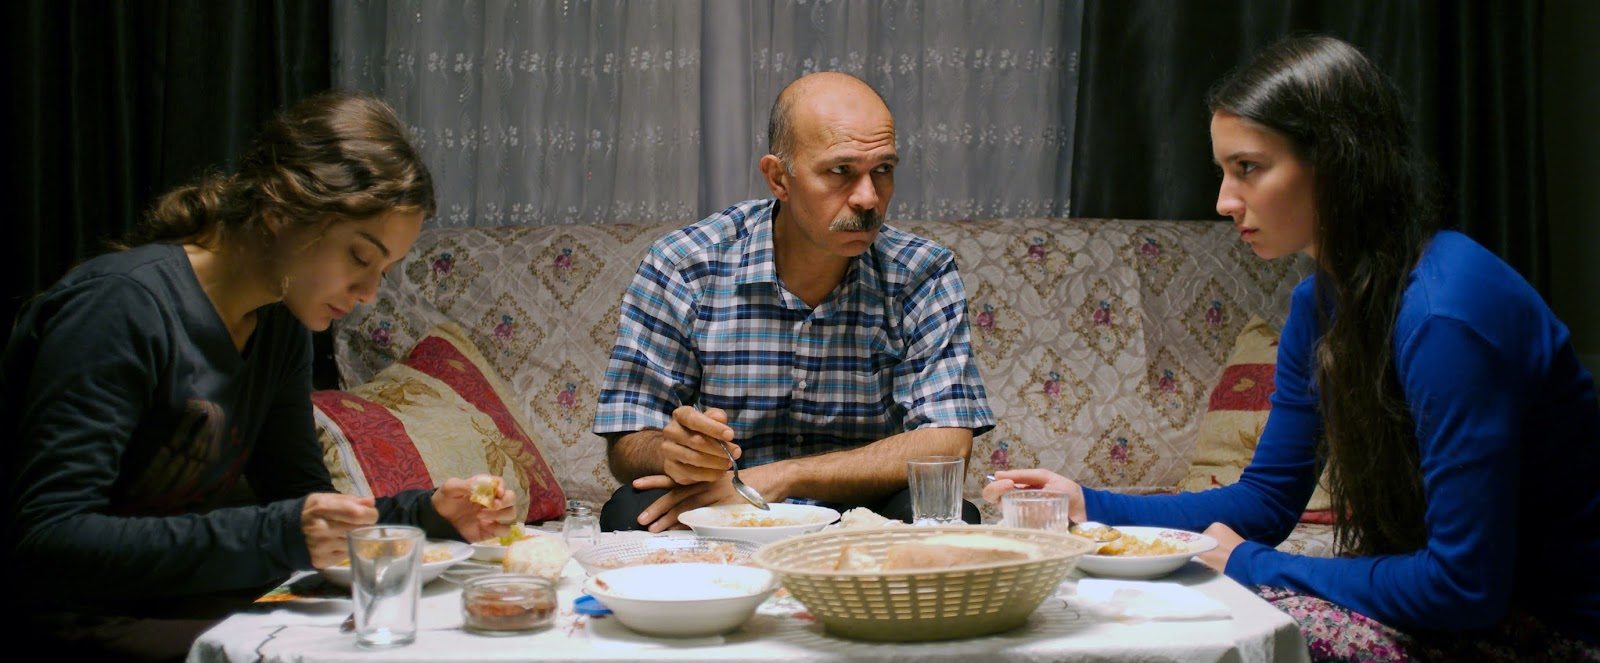 Vladimir Vdovichenkov uses weed on 19.11.2010